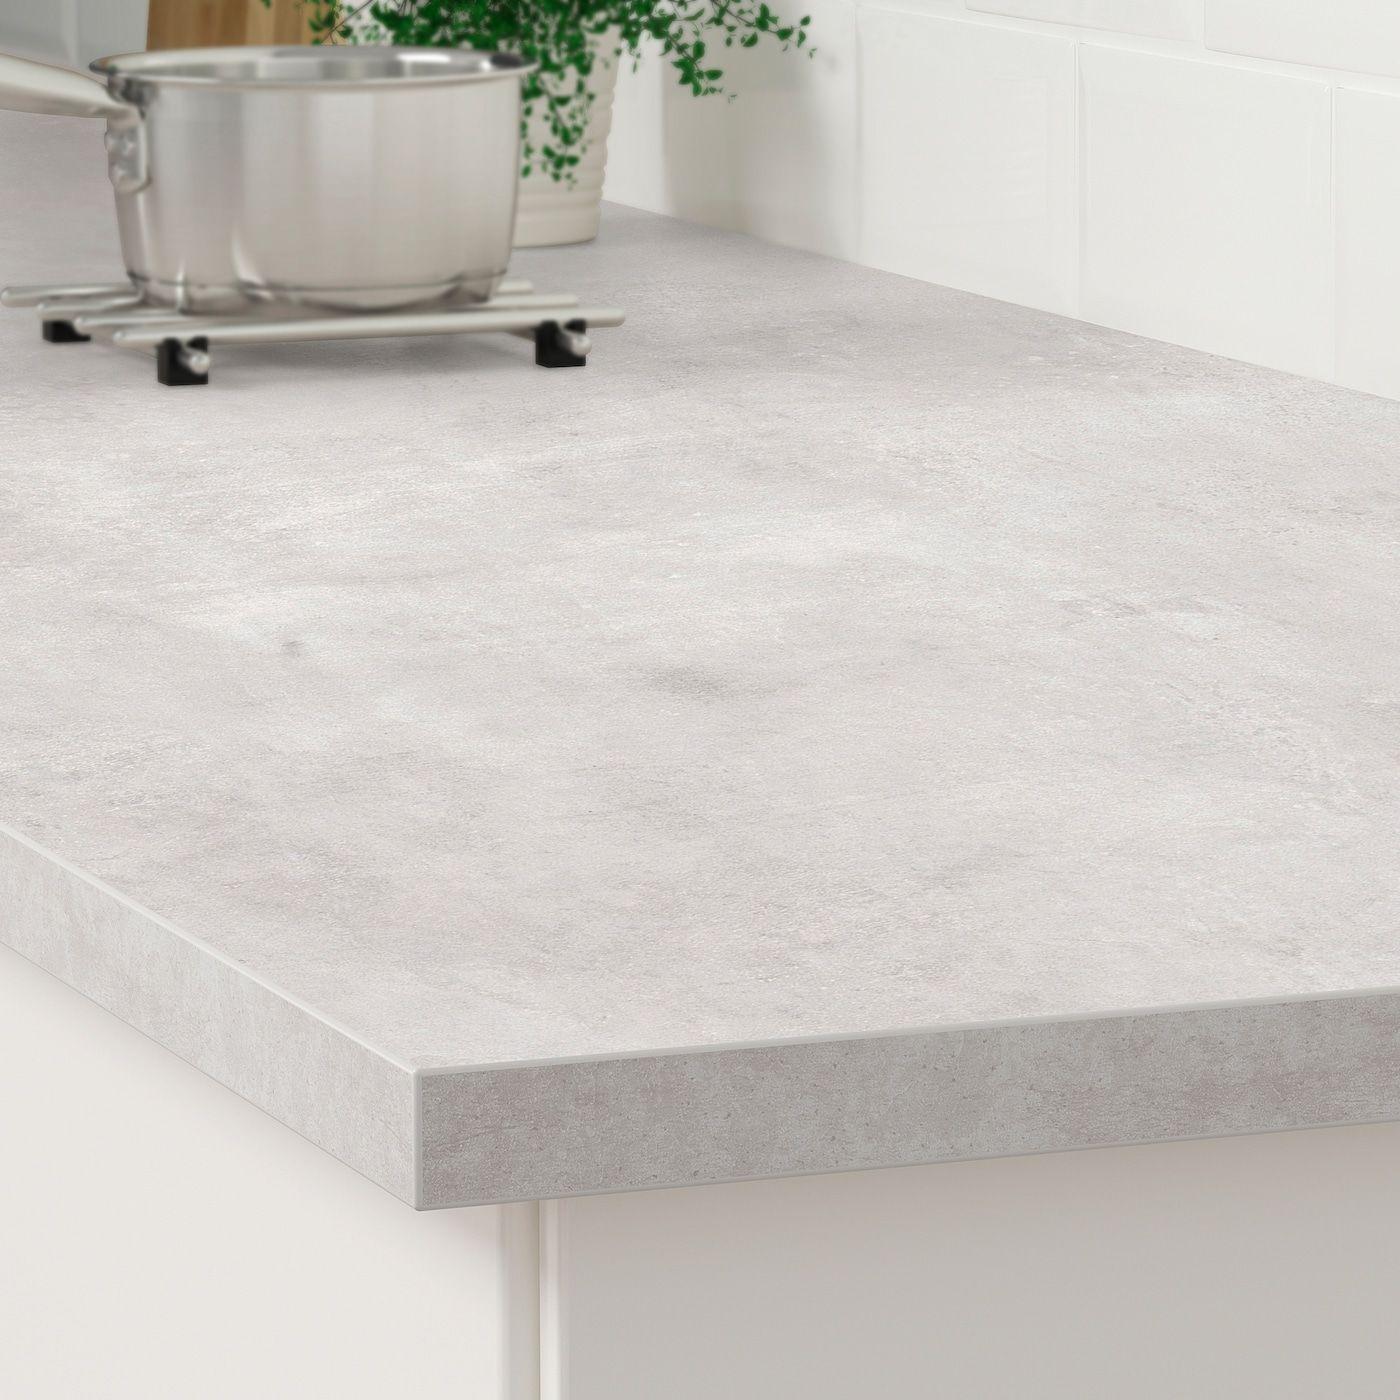 Ekbacken Arbeitsplatte Hellgrau Betonmuster Laminat Ikea Osterreich In 2020 Laminate Countertops Replacing Kitchen Countertops Countertop Materials